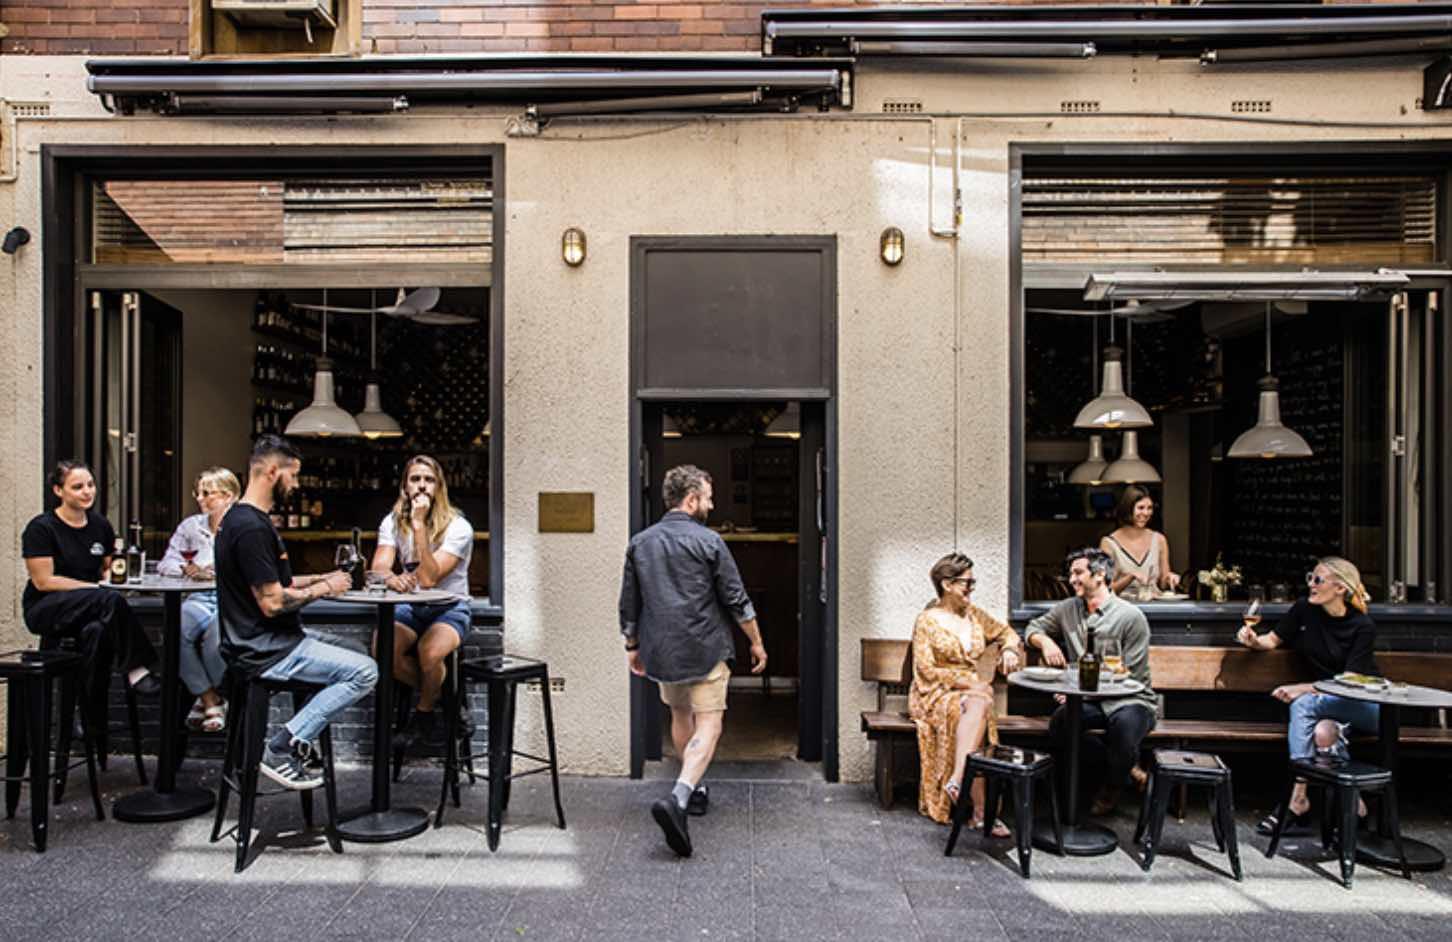 covid friendly restaurant for date in Sydney - dear sainte eloise